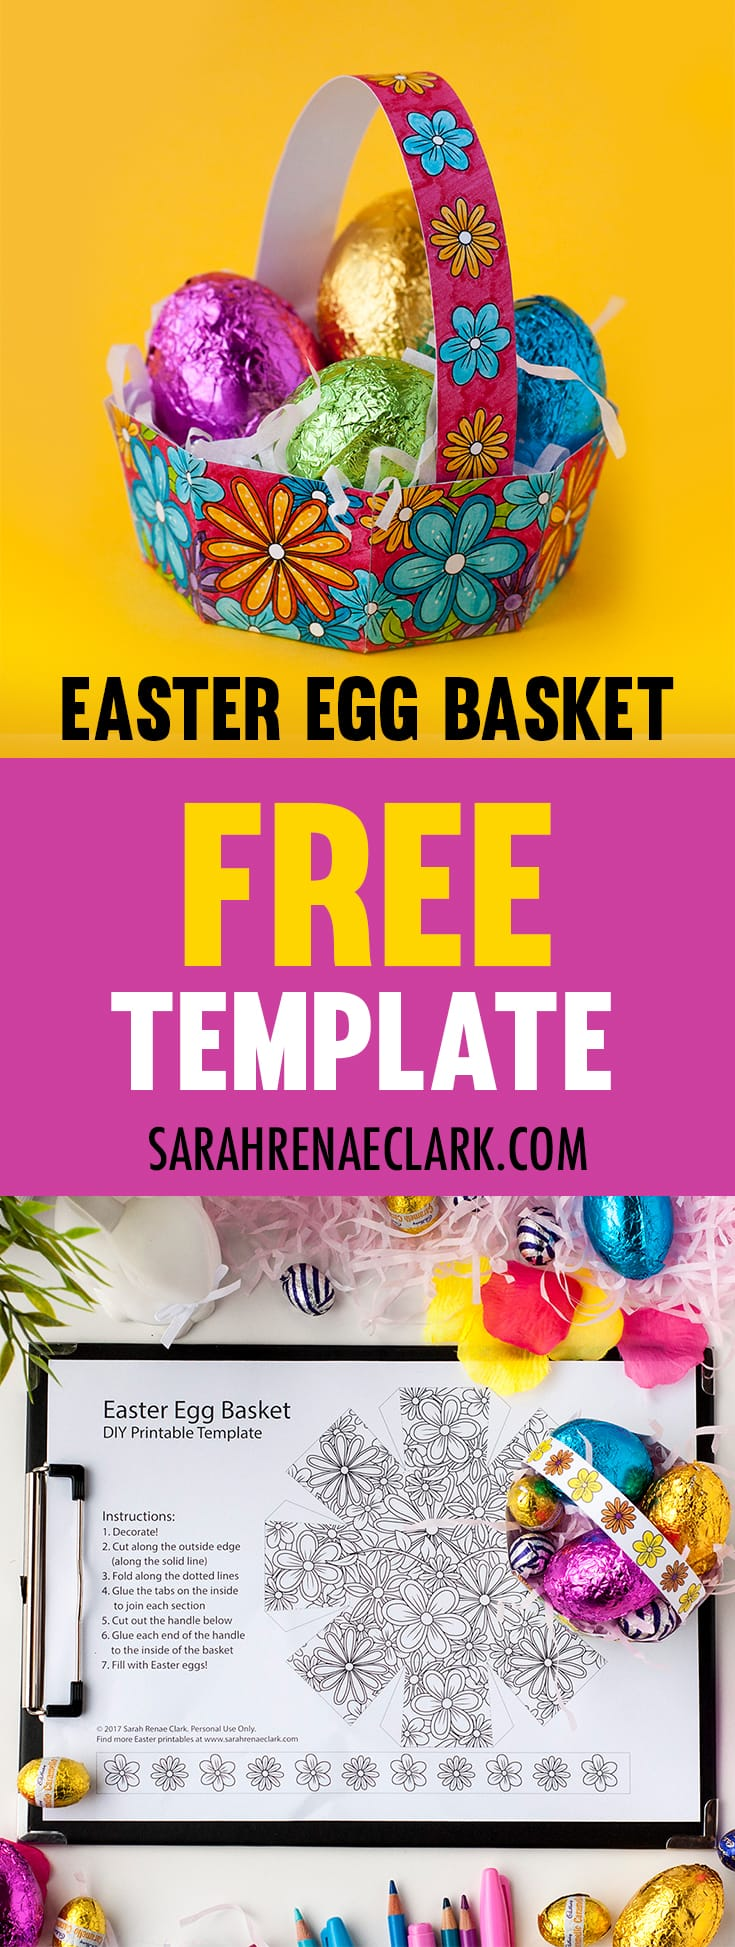 Easter basket to make free download.